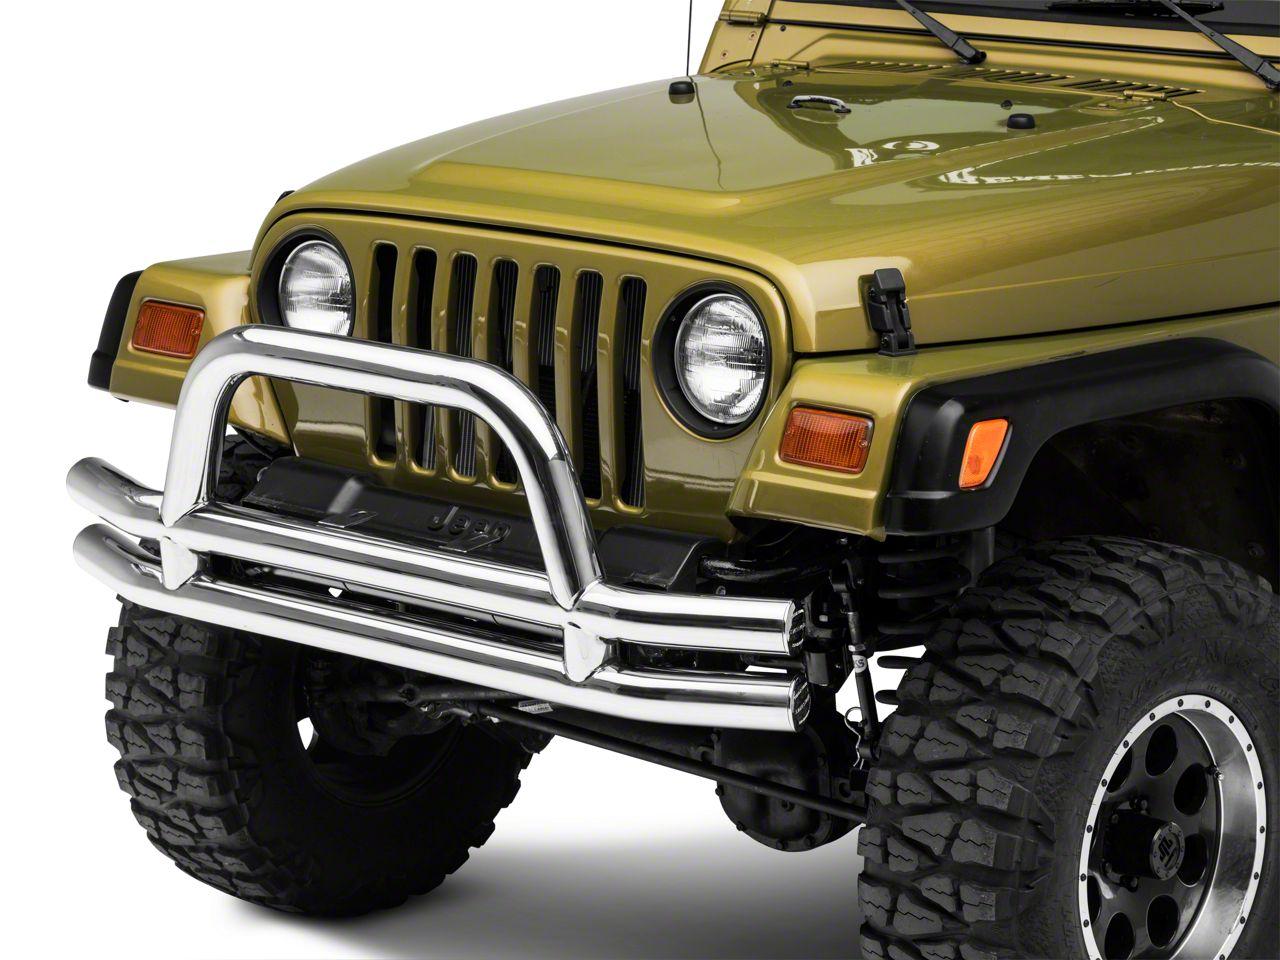 Add Smittybilt Tubular Front Bumper w/ Hoop, Stainless Steel (87-06 Wrangler YJ & TJ)